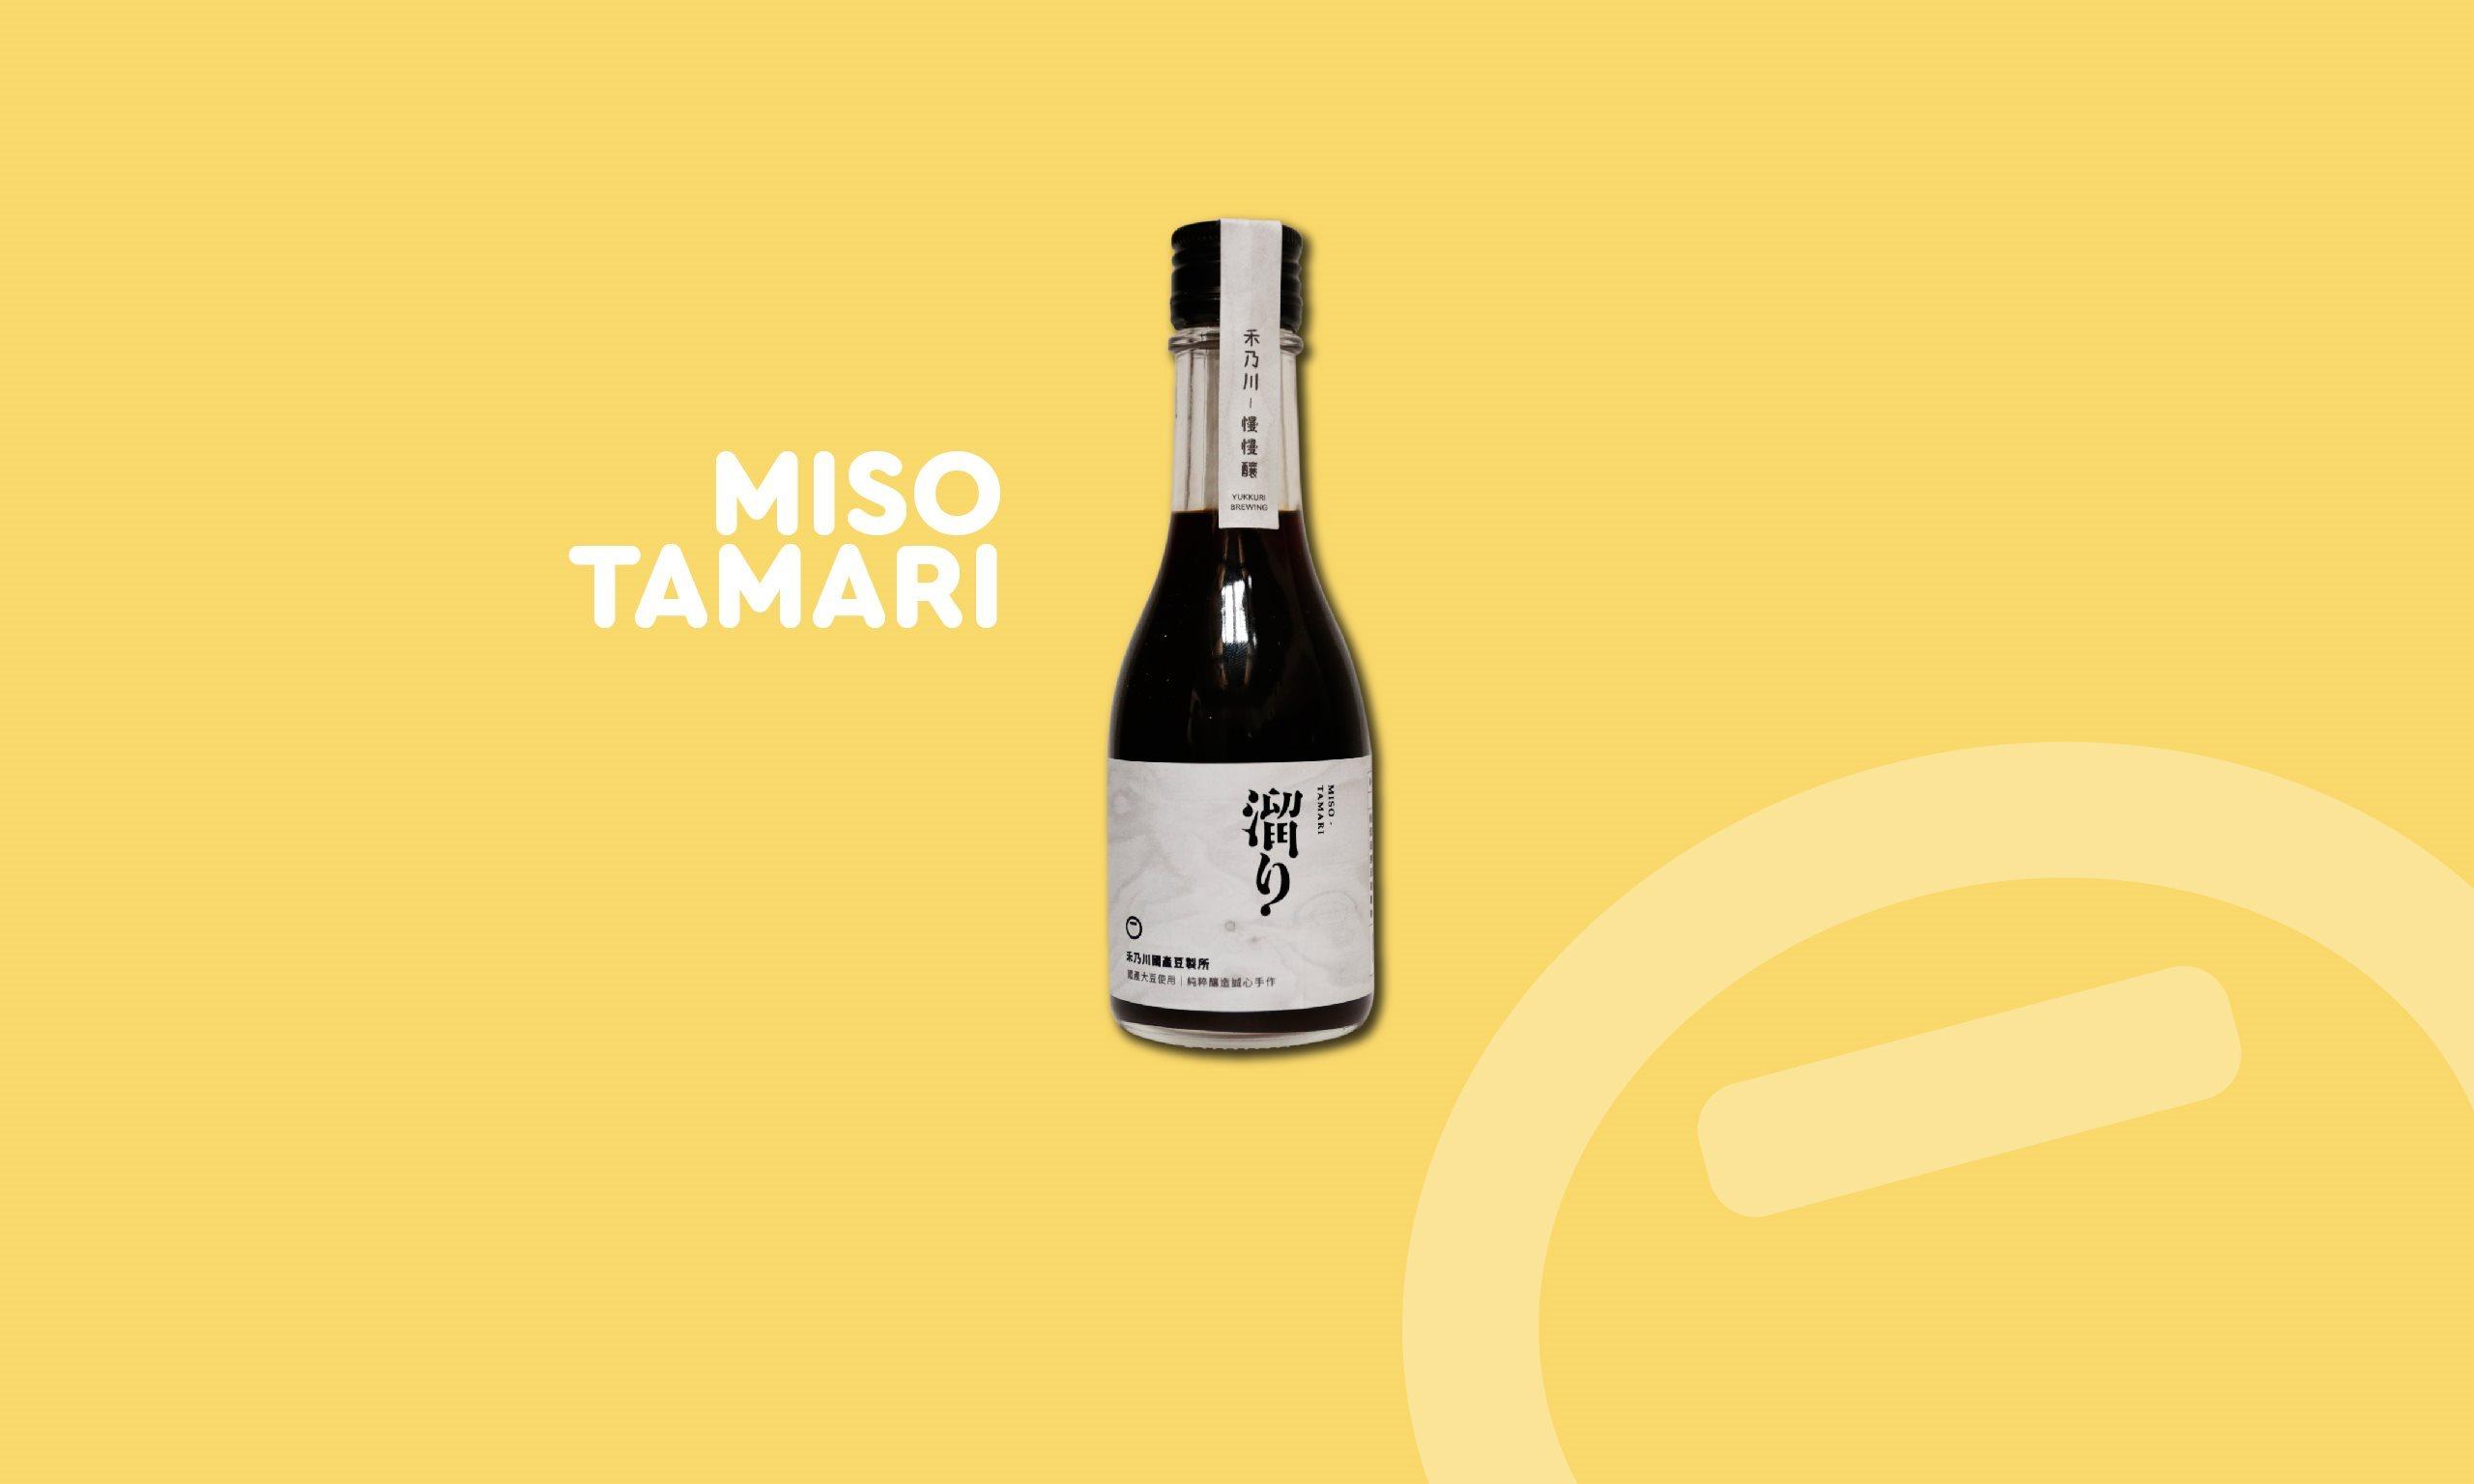 Hidekawa Miso Tamari - Taiwan handmade miso sauce is good taste facilitator for home-cooked